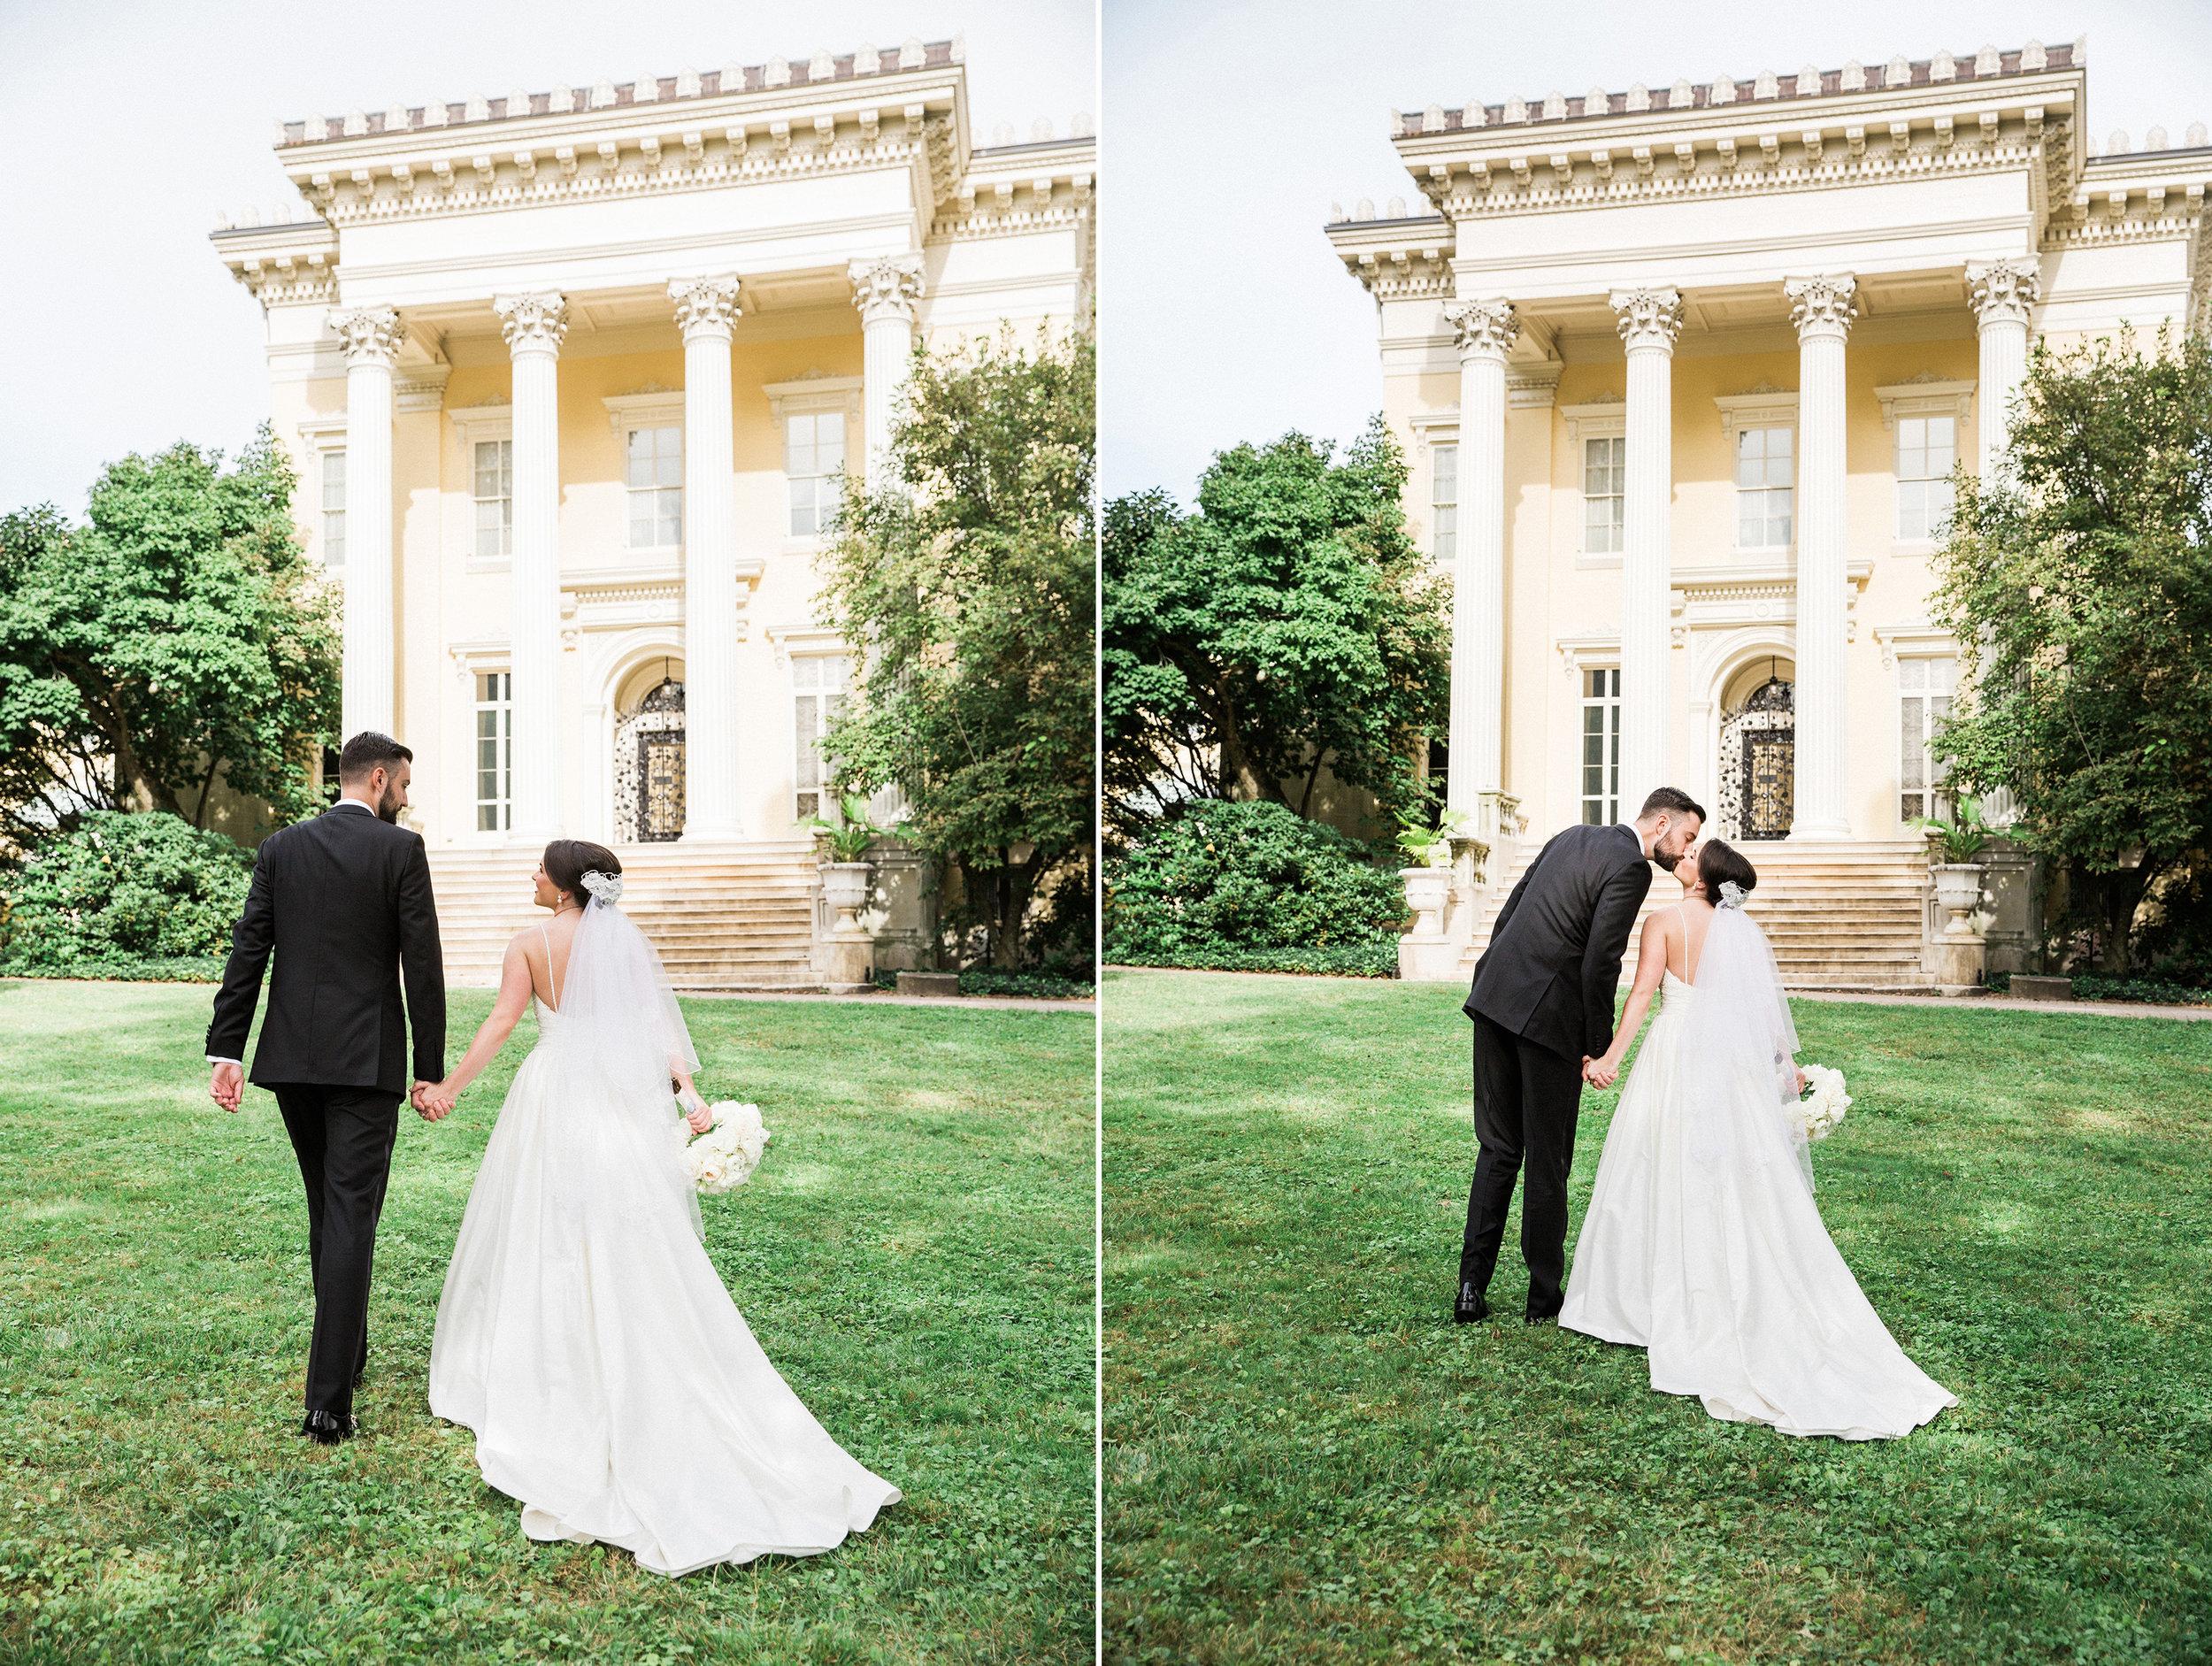 Evergreen-Museum-Balitmore-Maryland-Wedding-Black-Tie-Bride-010.jpg